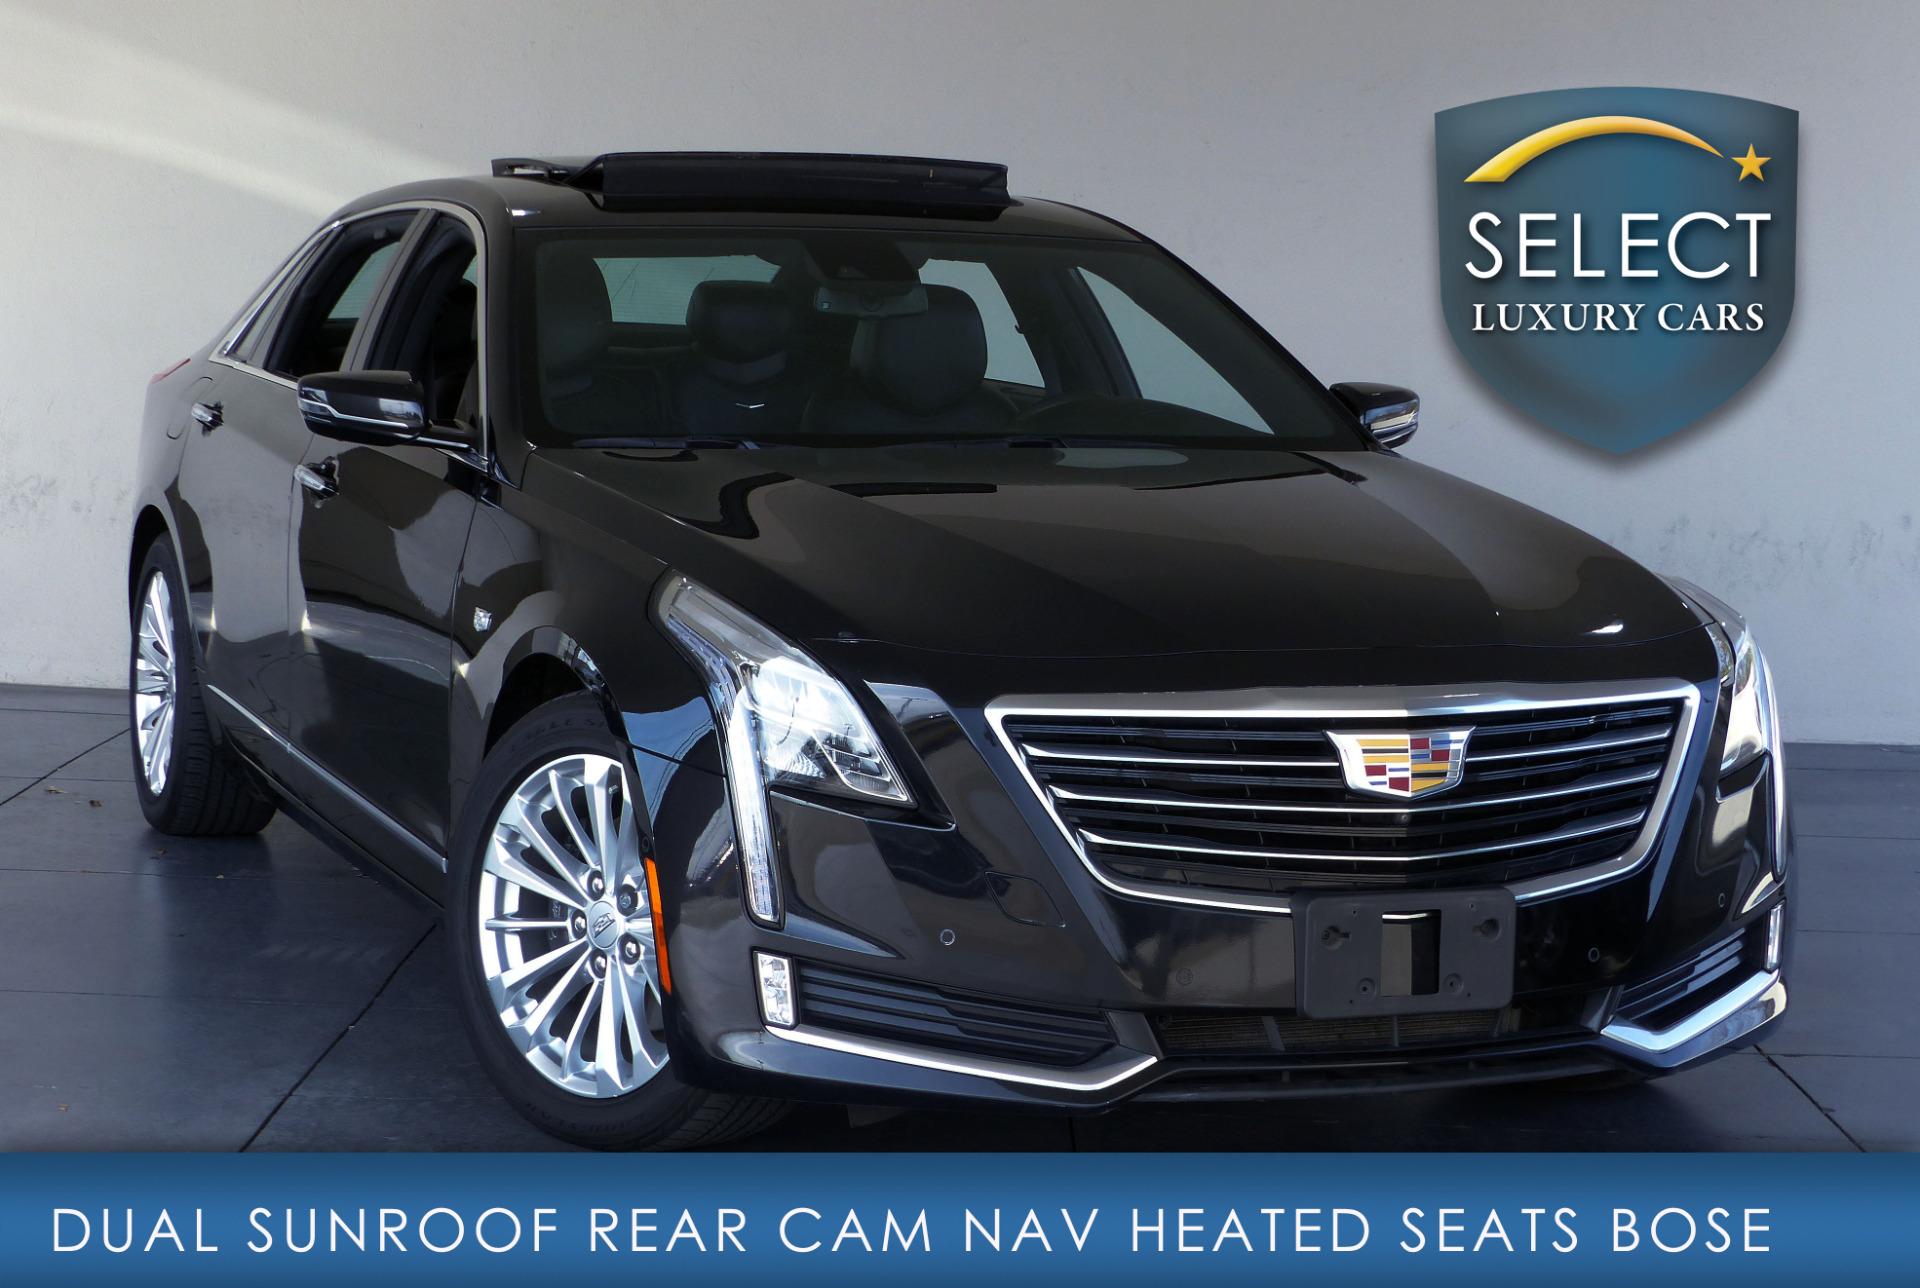 2017 Cadillac Ct6 2 0 L Turbo Luxury >> Used 2016 Cadillac Ct6 2 0l Turbo Luxury Marietta Ga